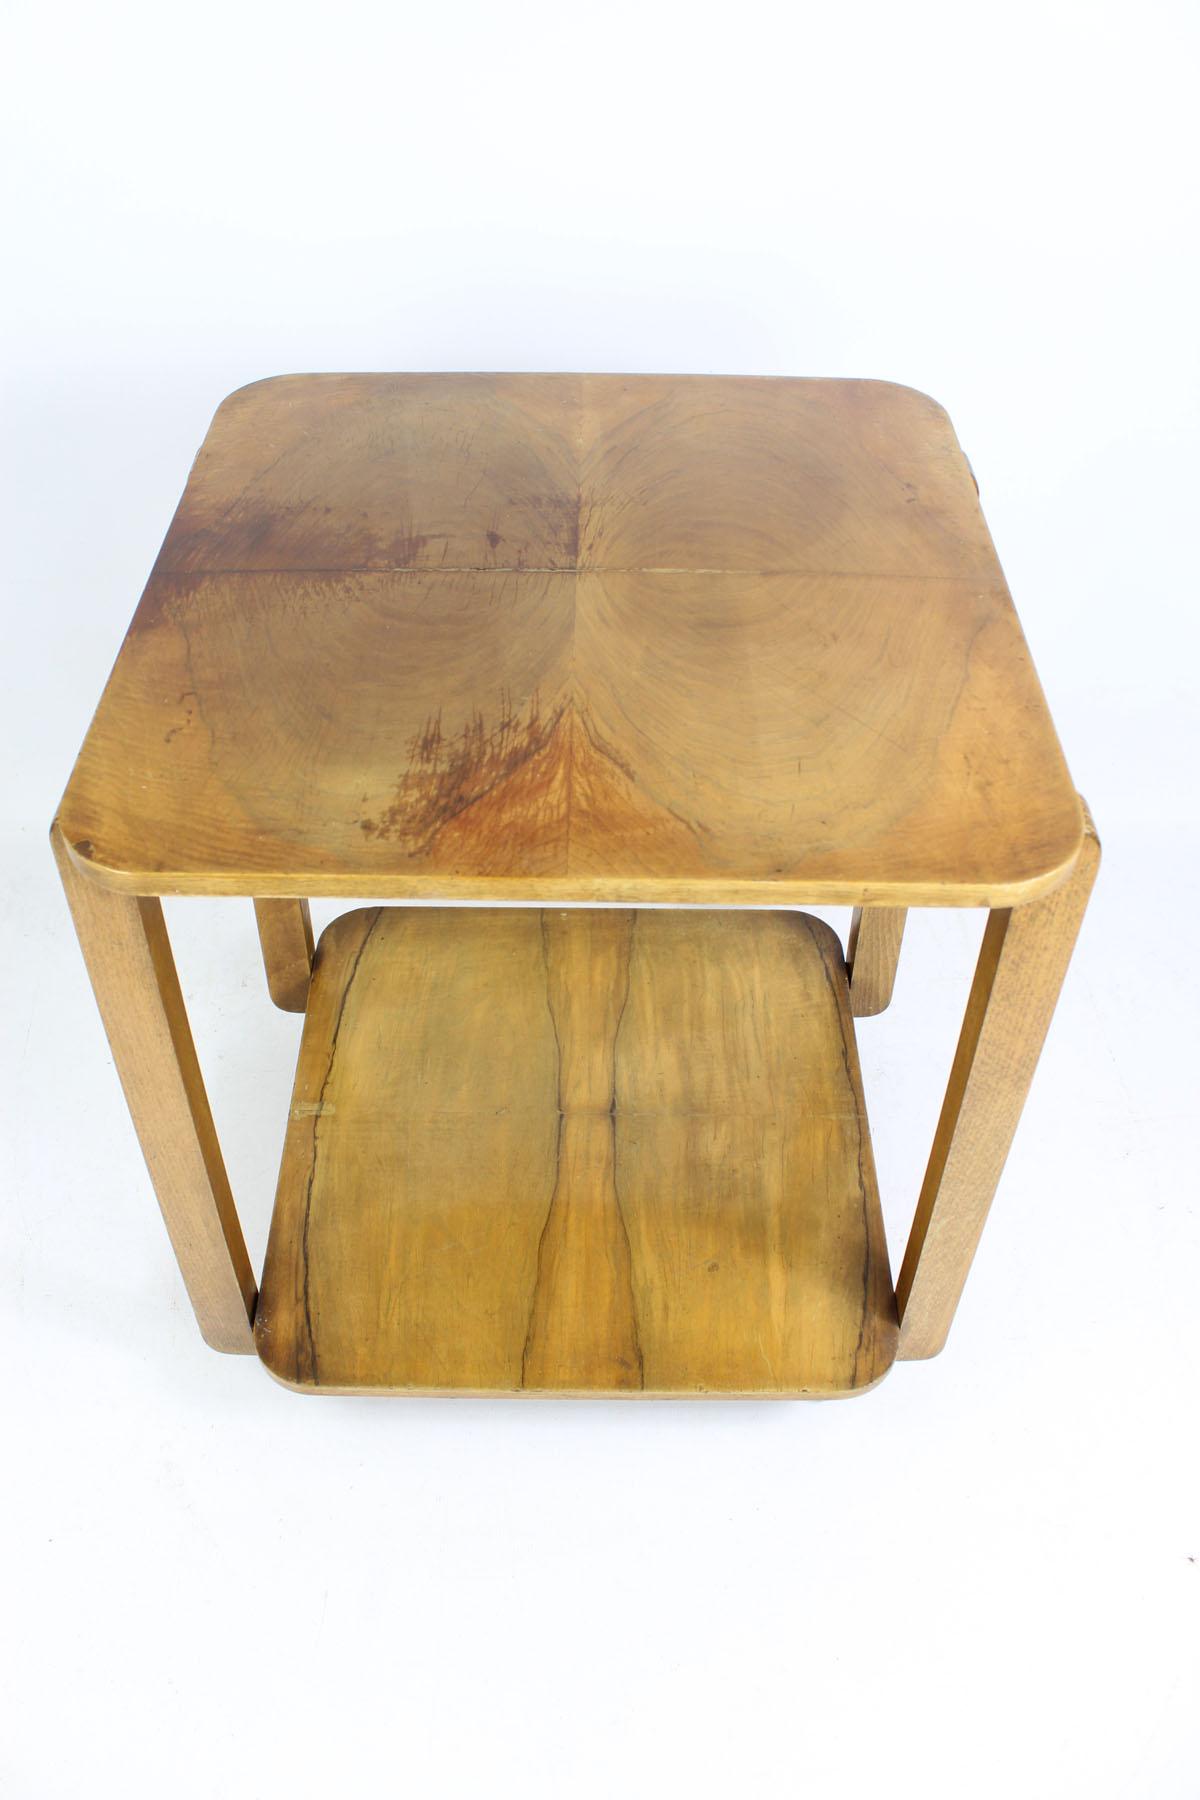 Small Art Deco Tea Trolley Coffee Table